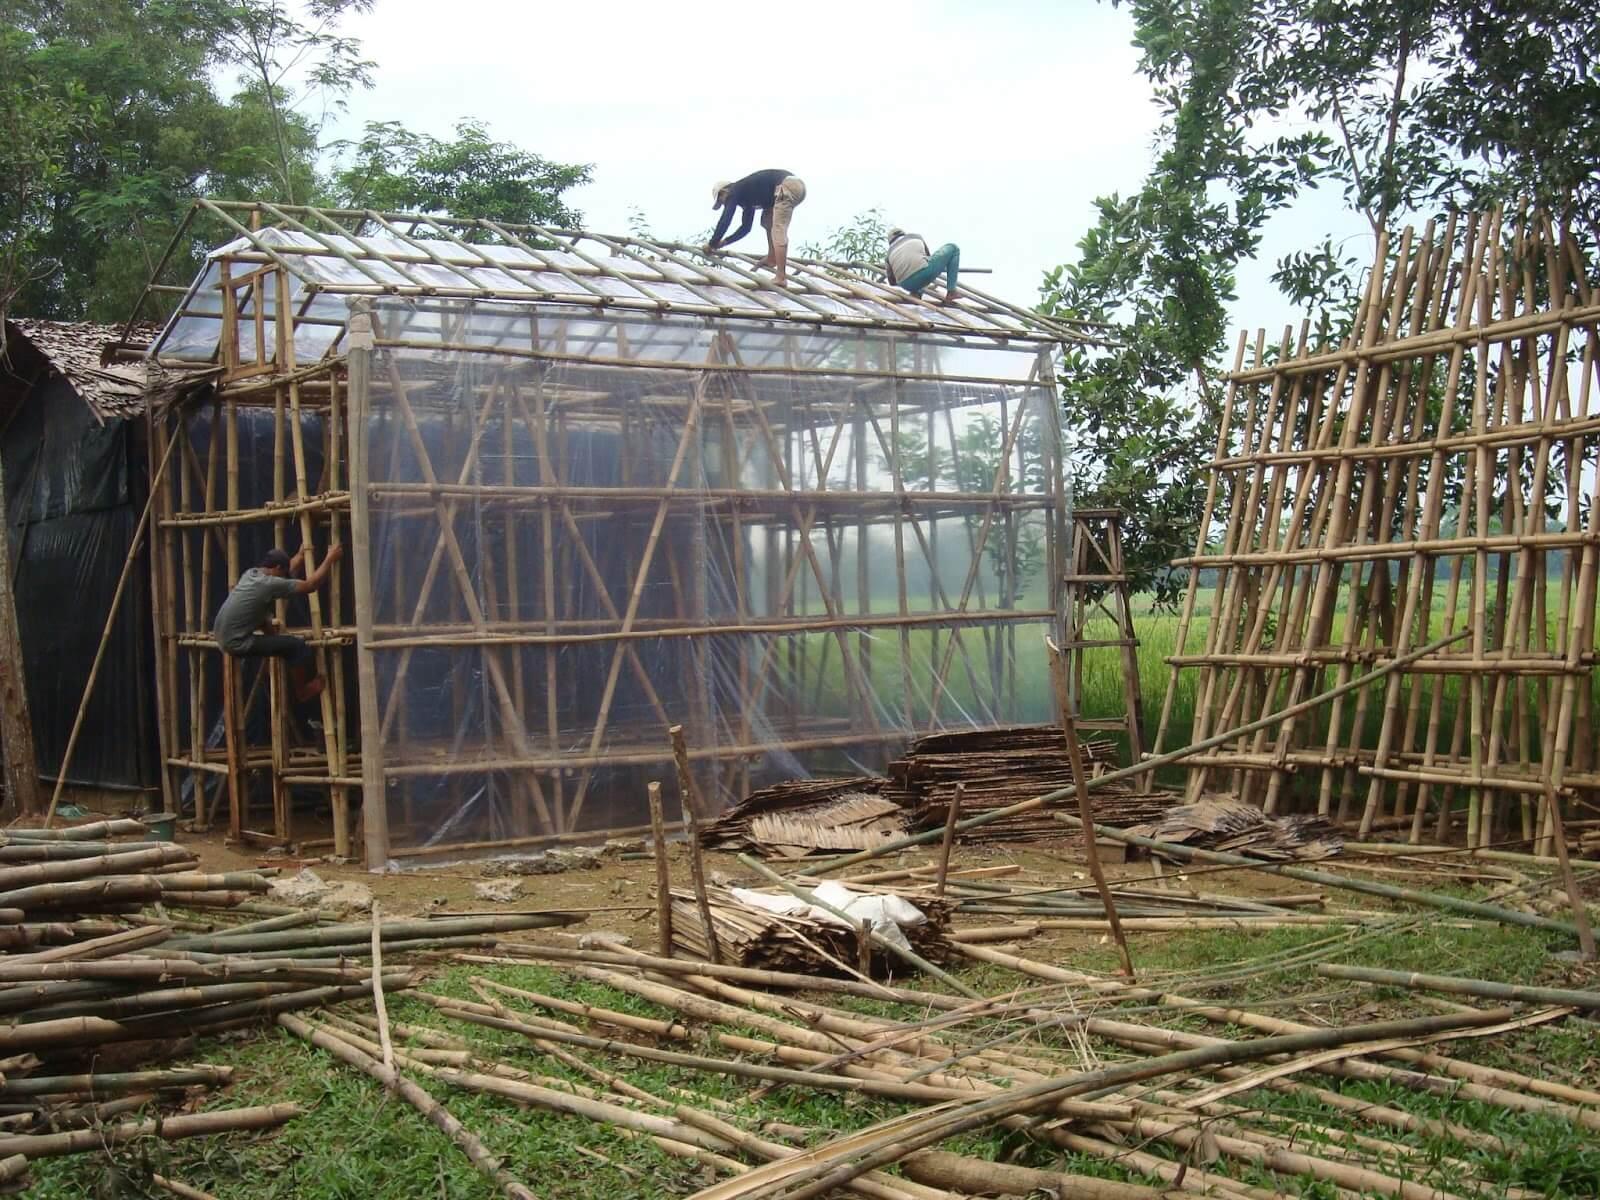 Membuat Kumbung Untuk Budidaya Jamur Merang